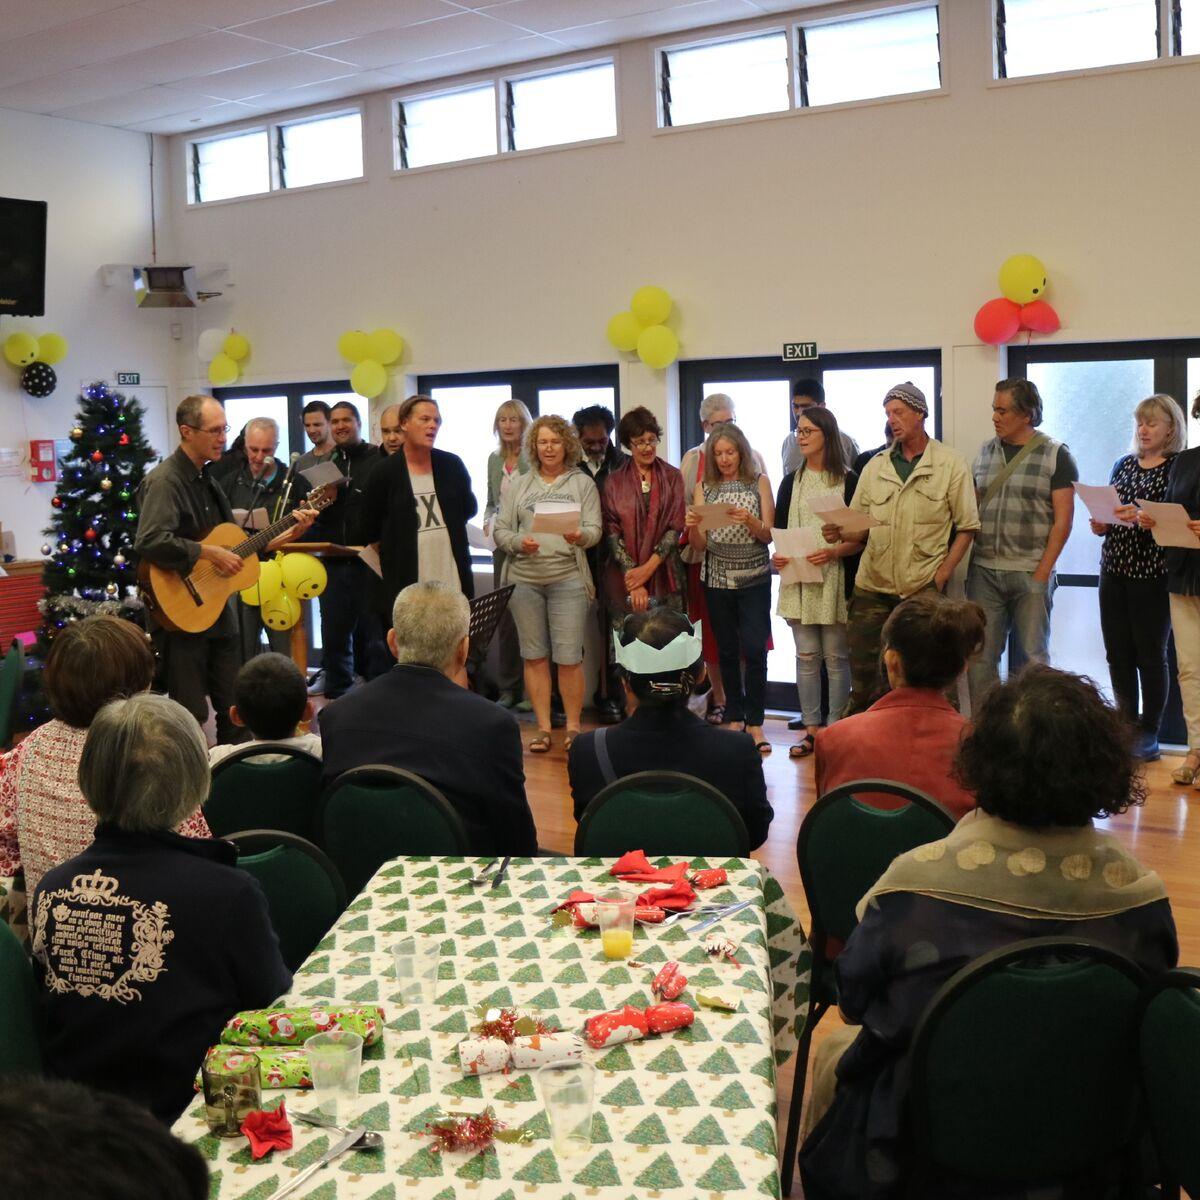 kiwi Chrisrtmas 7 Street Choir Dec 16.jpg